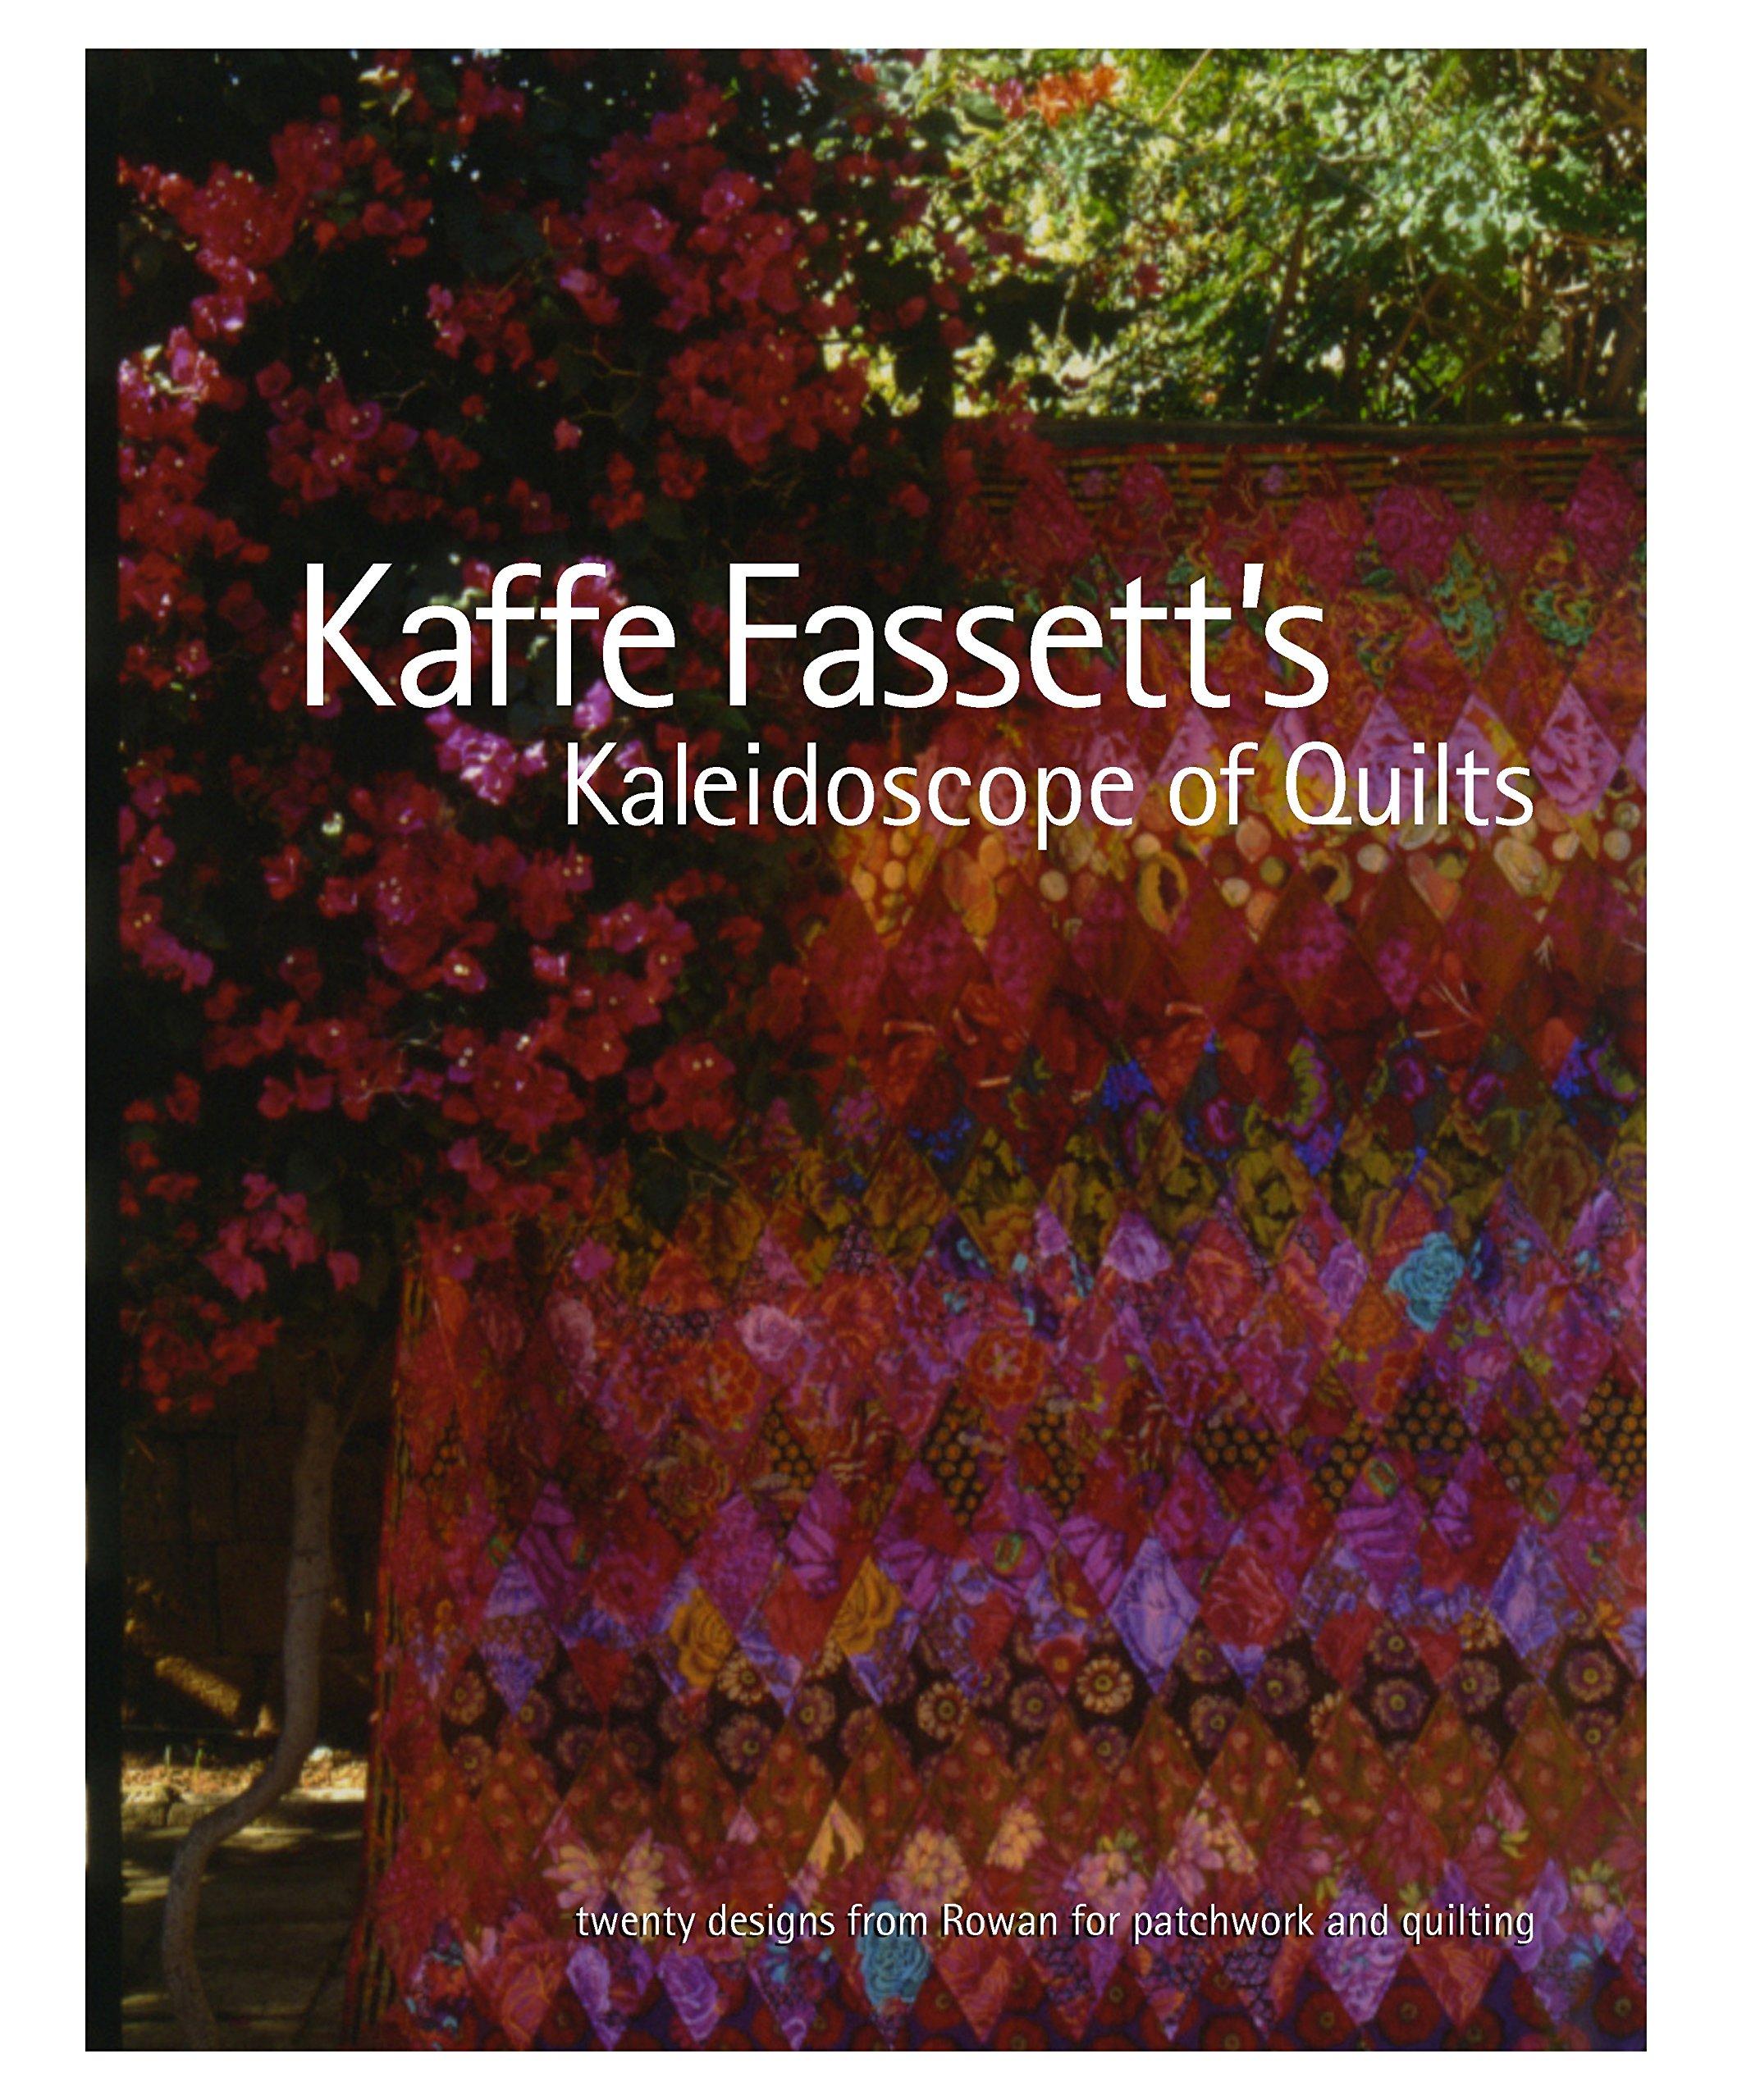 Kaffe Fassett's Kaleidoscope of Quilts: Twenty Designs from Rowan for Patchwork and Quilt